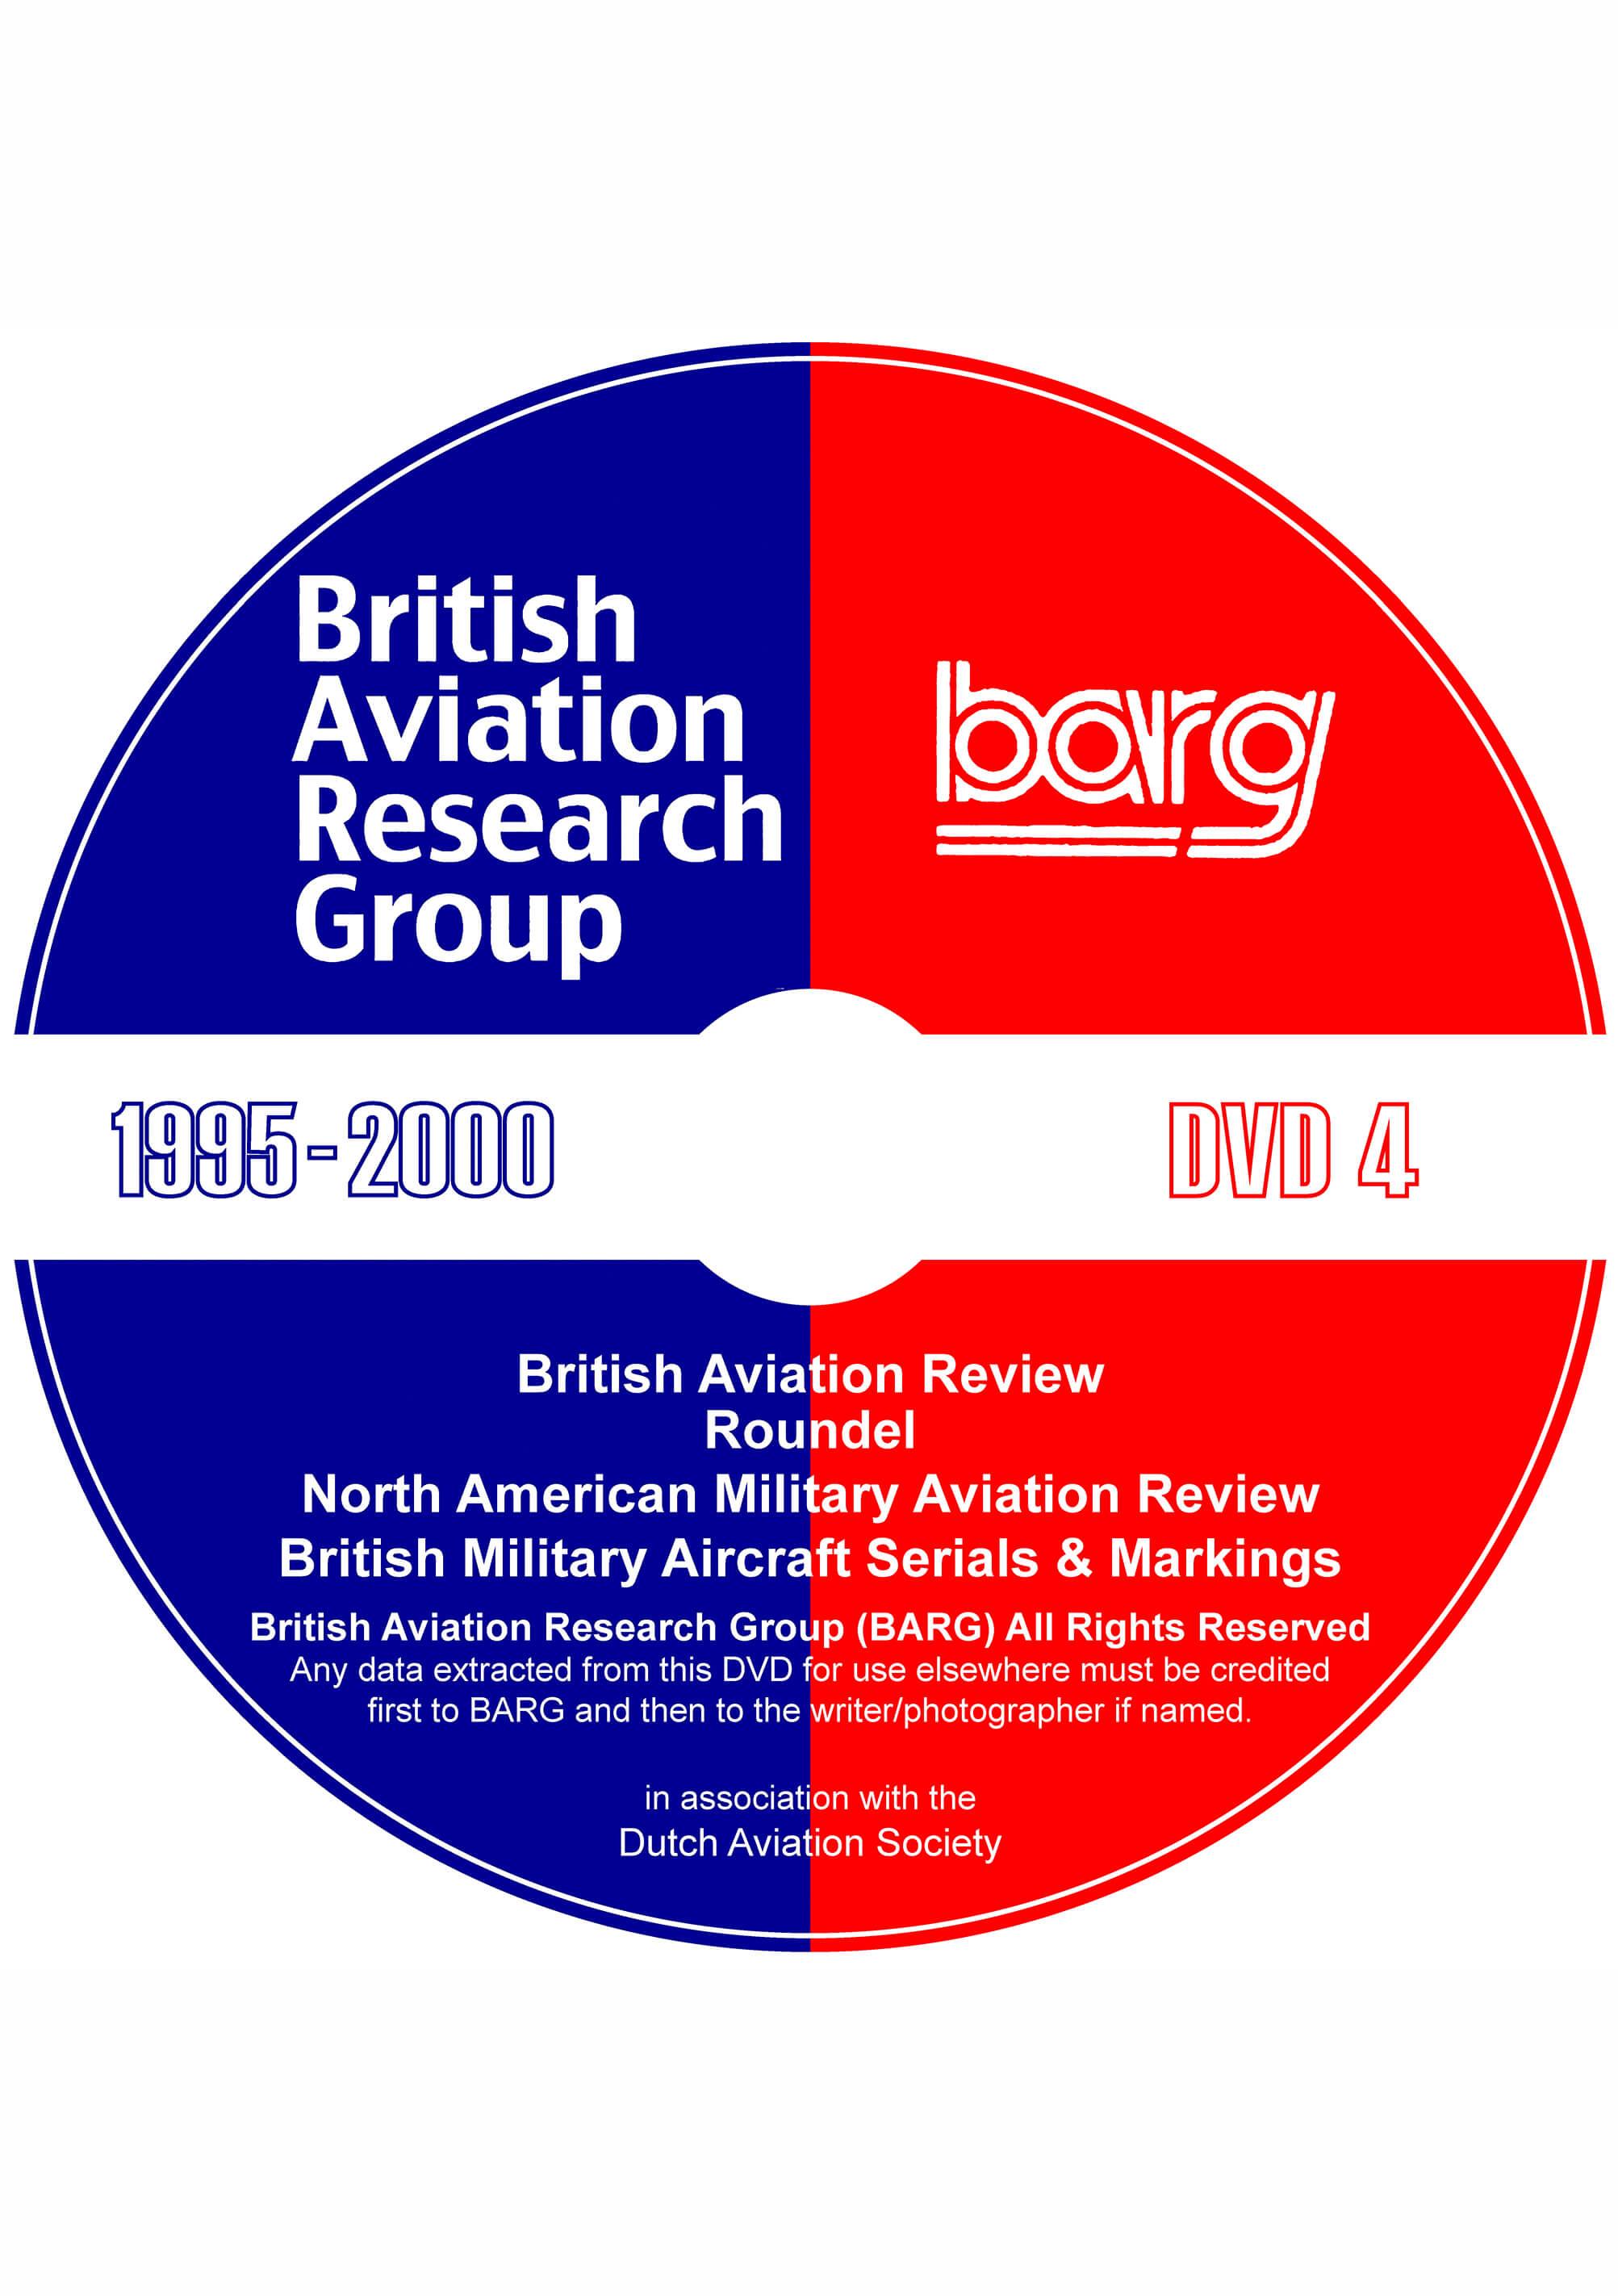 BARG DVD 4 (1995-2000)